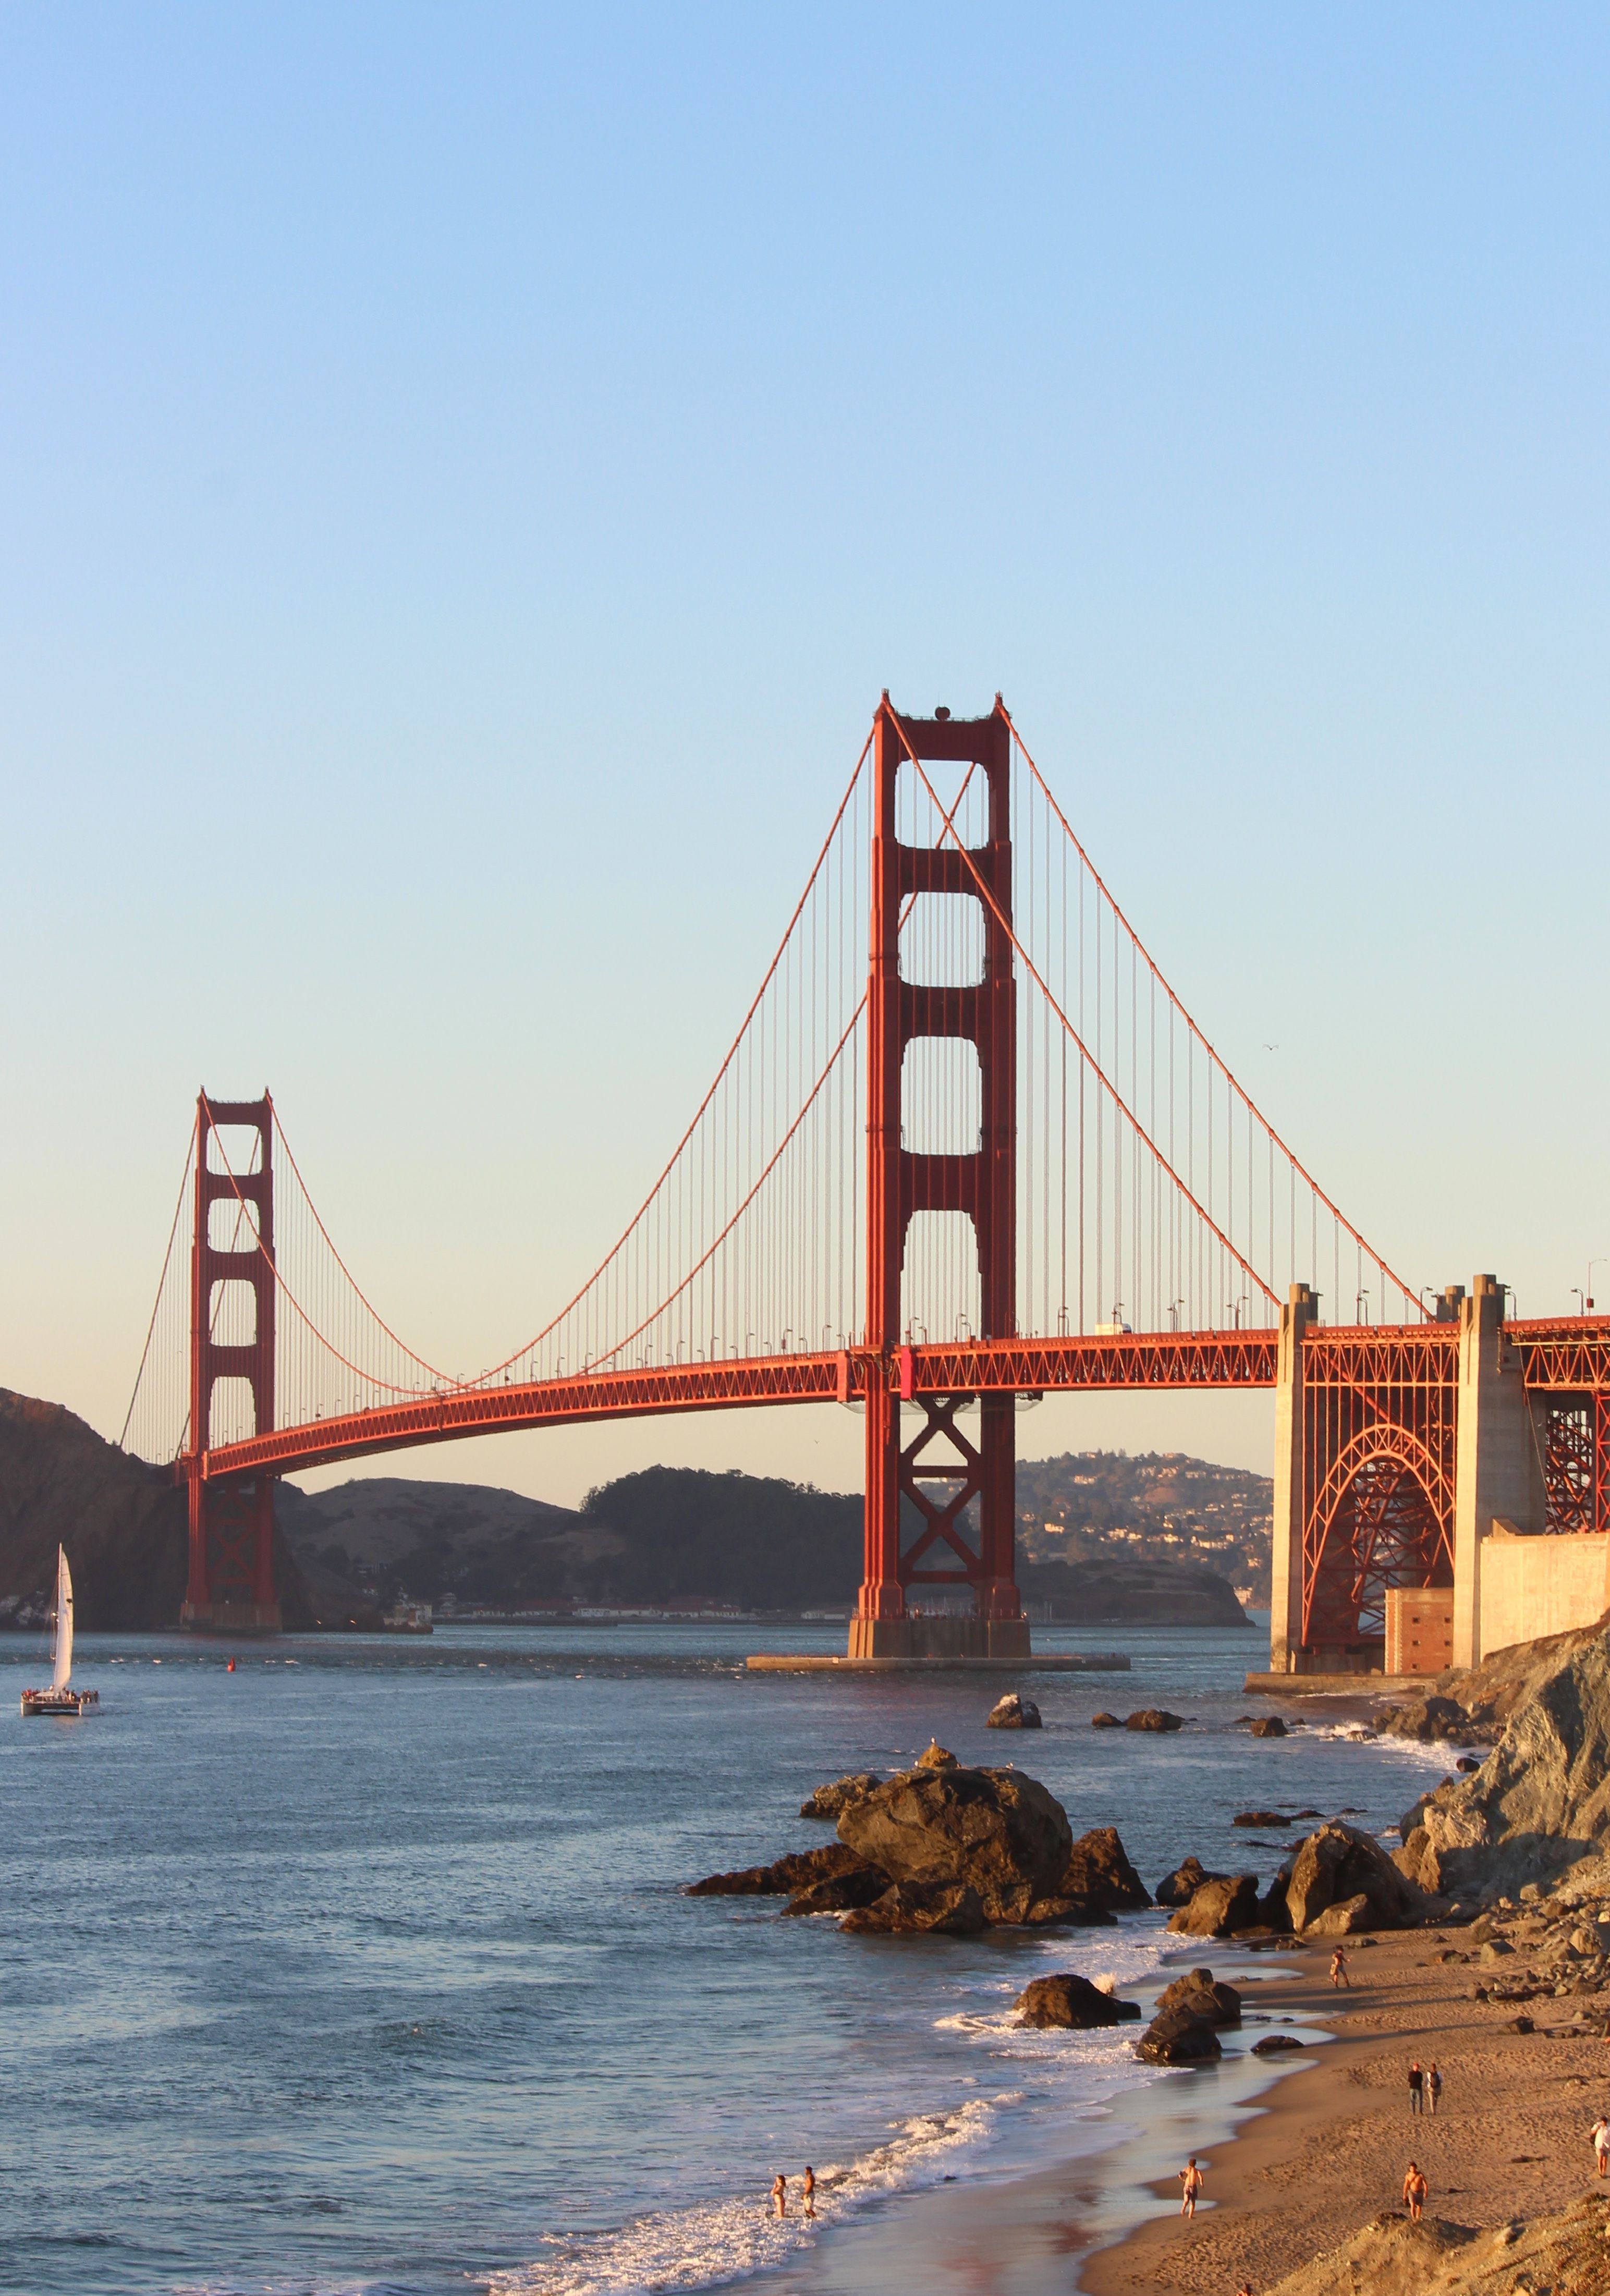 San Francisco Vacation Packages 2017 - Book San Francisco